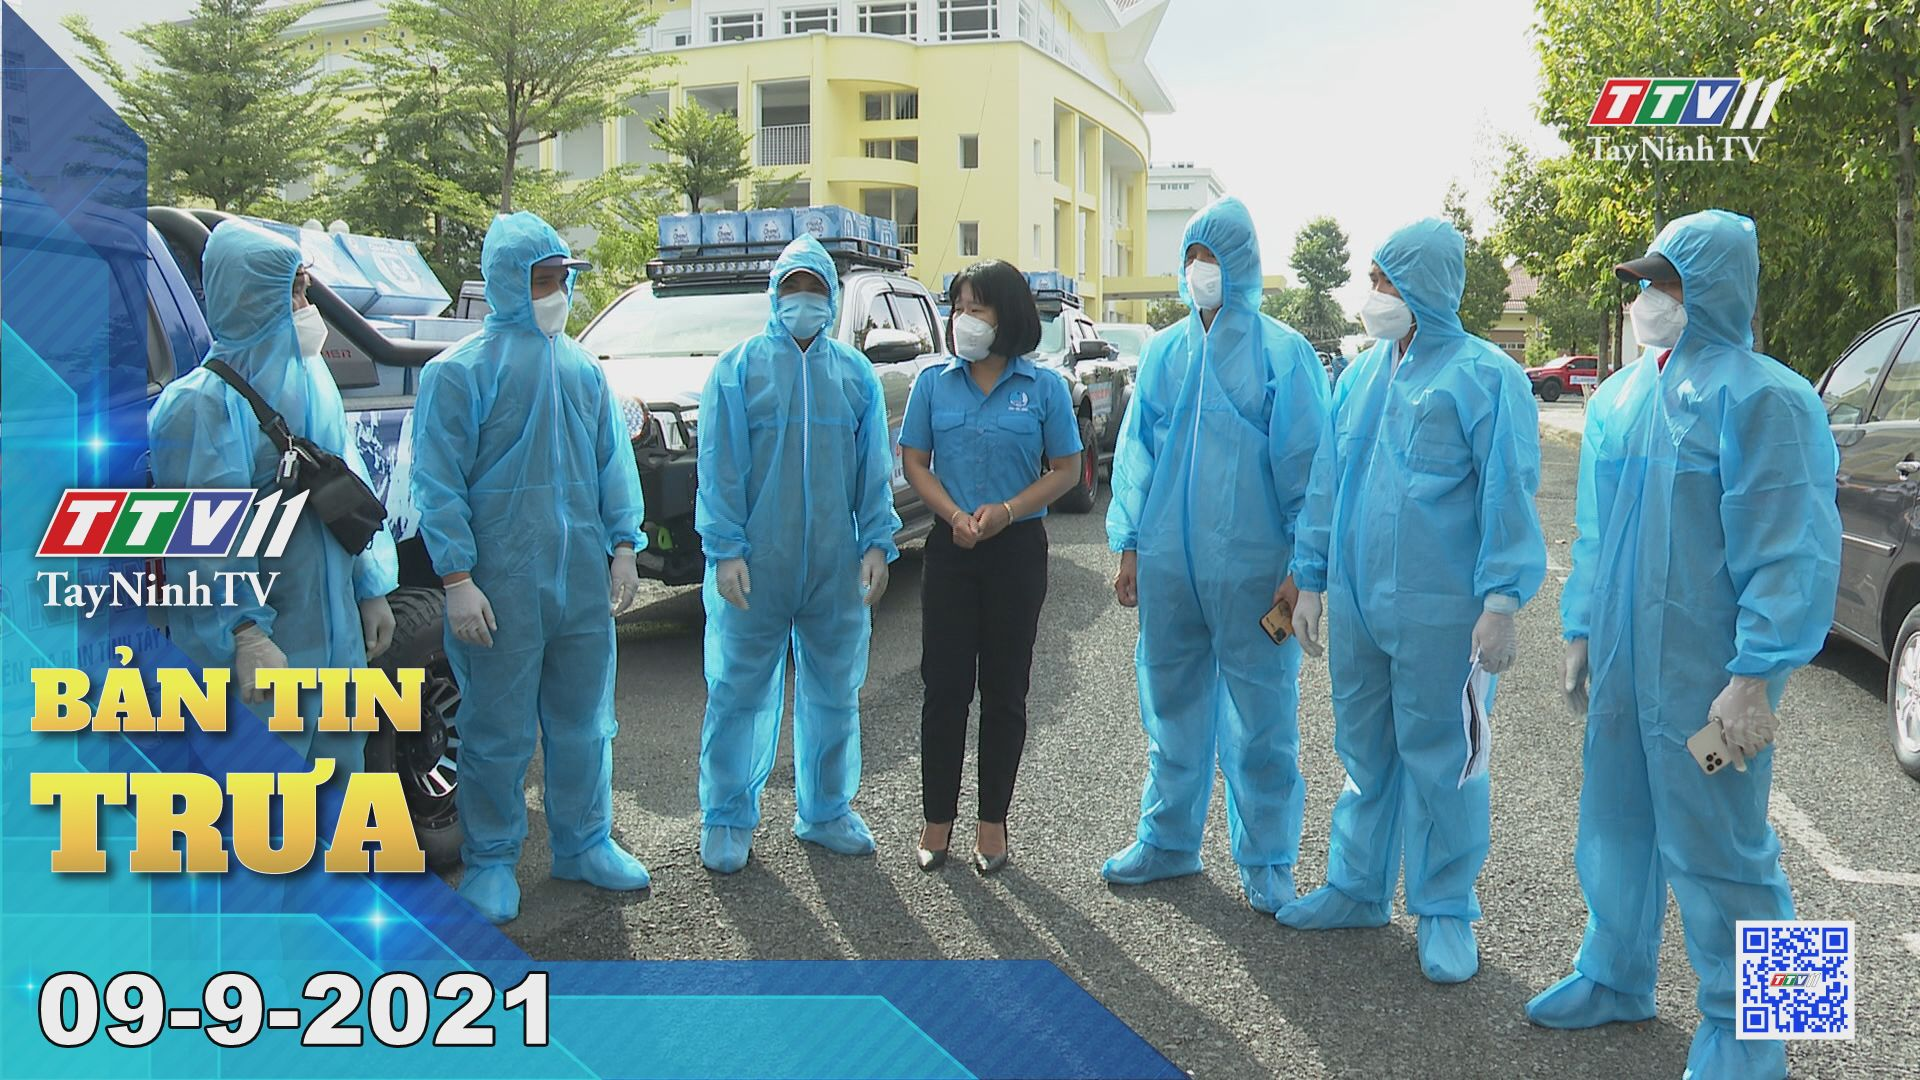 Bản tin trưa 09-9-2021 | Tin tức hôm nay | TayNinhTV